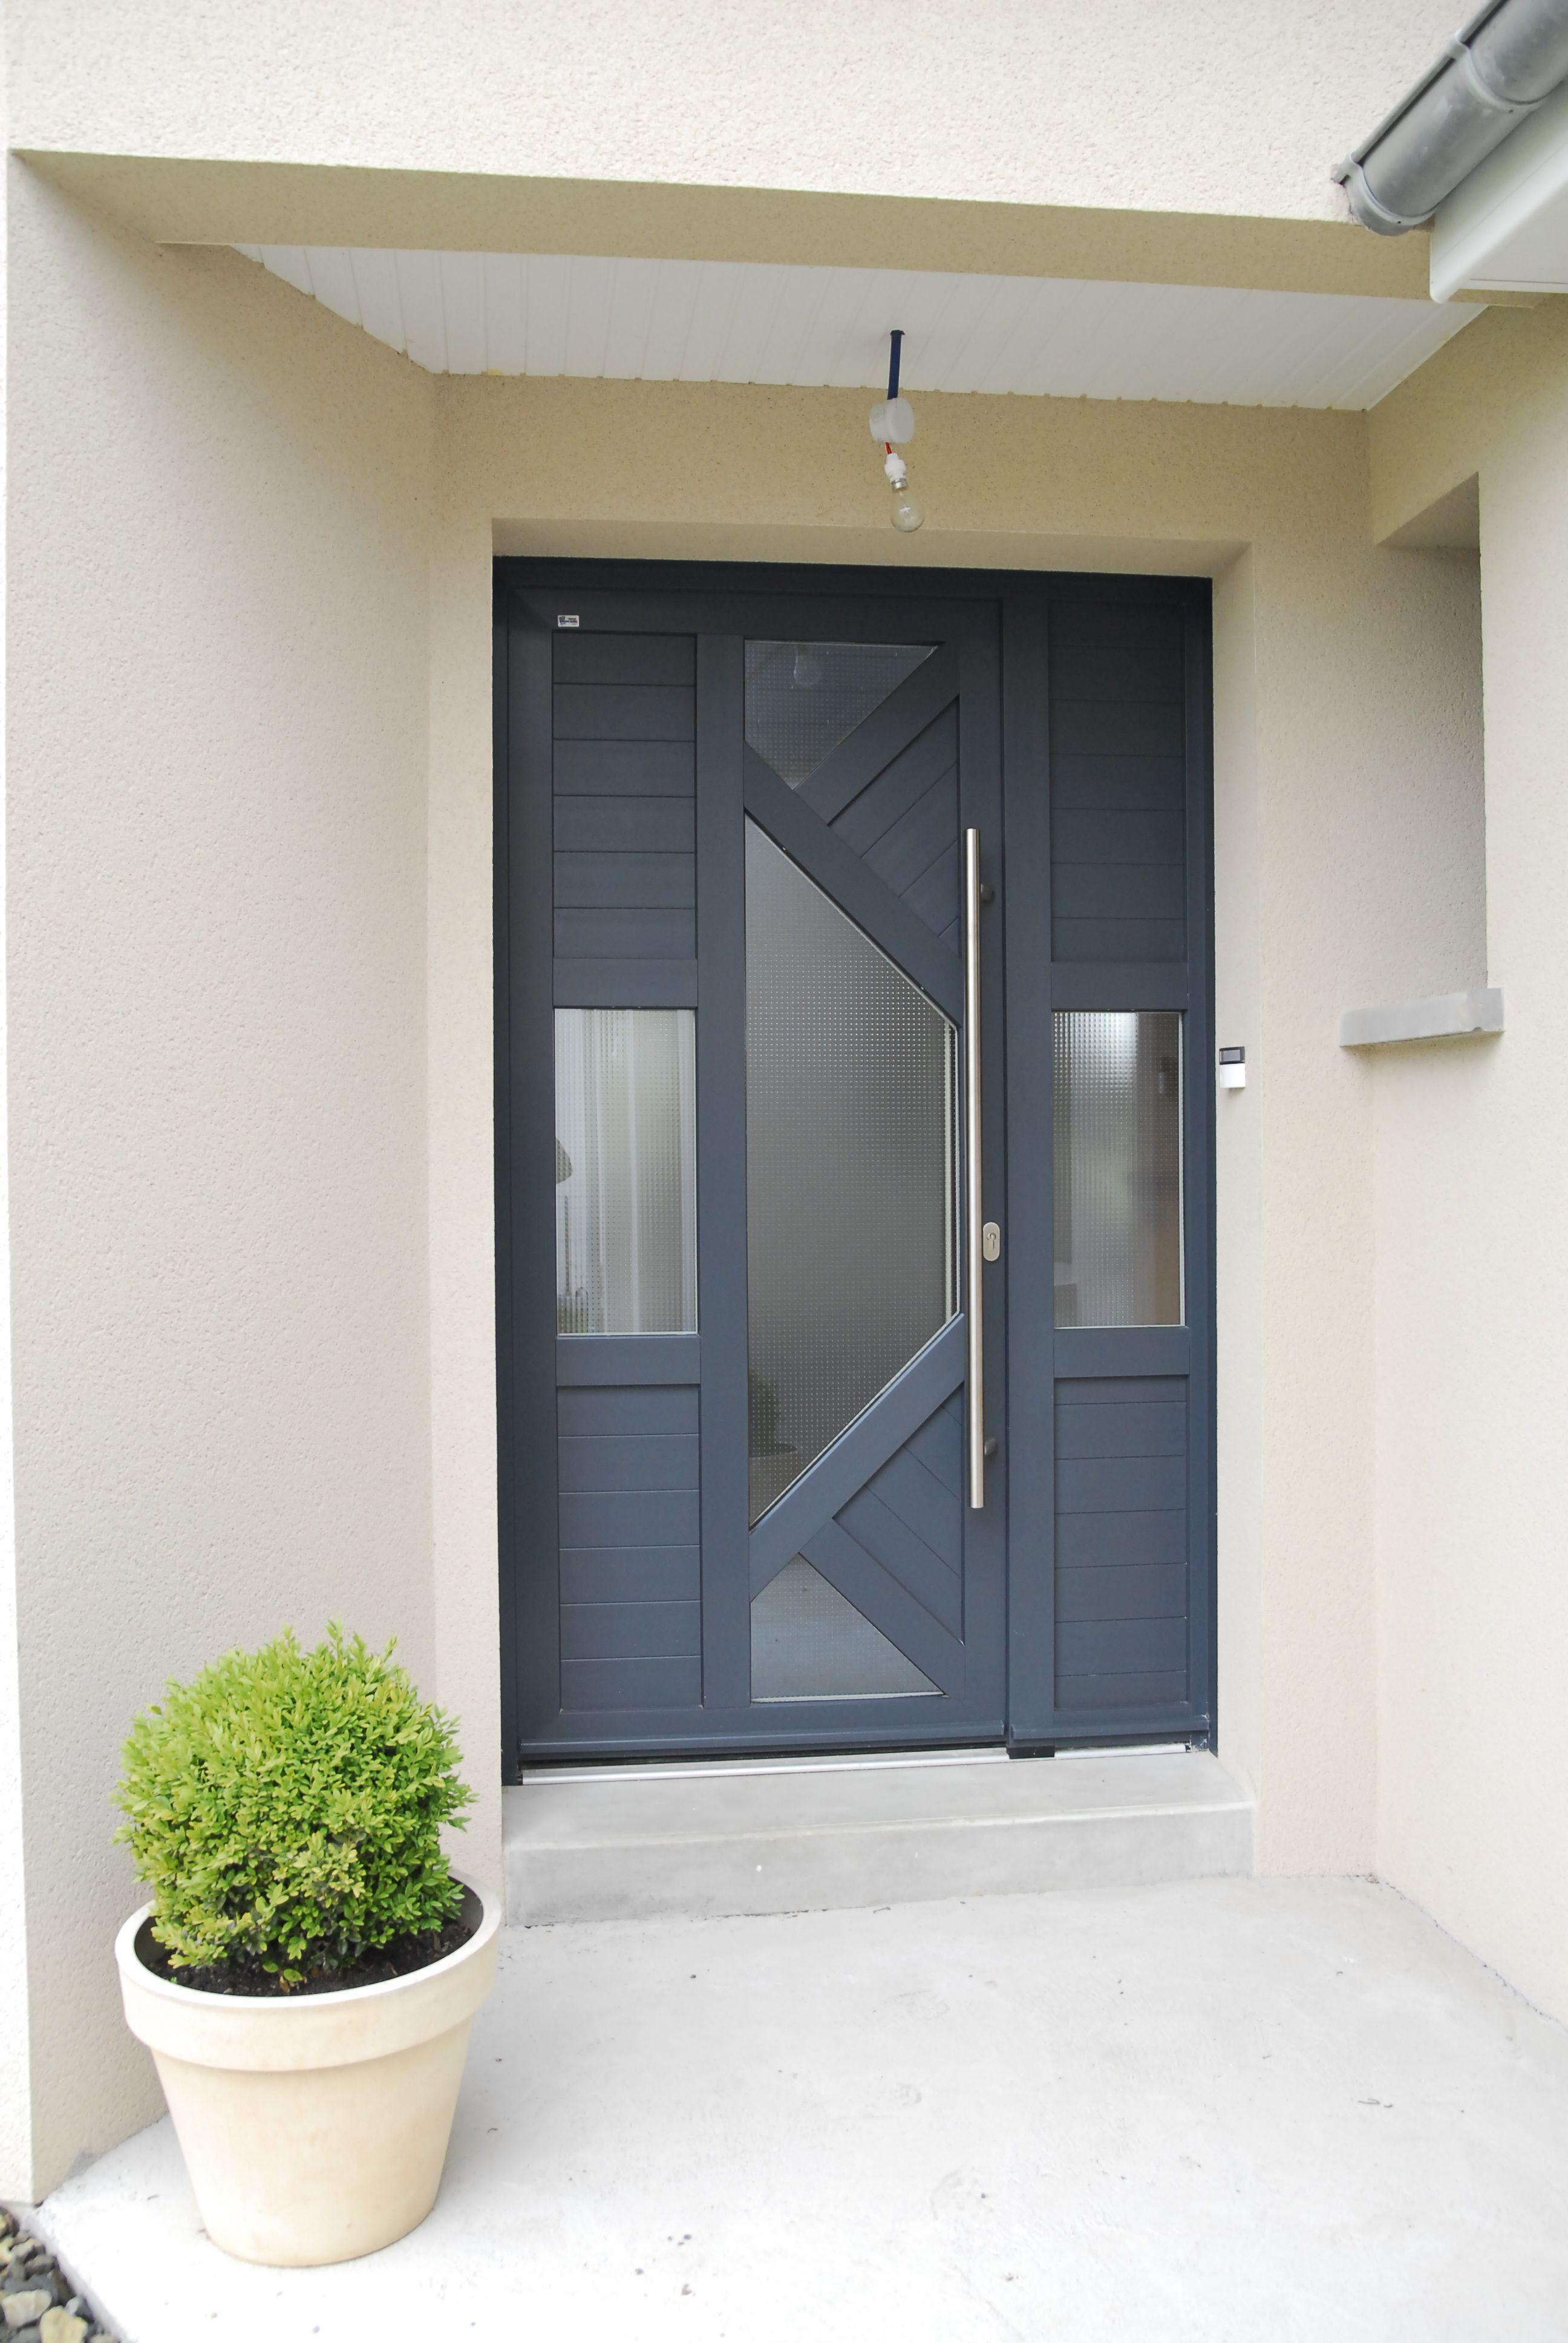 Porte d 39 entr e pvc mod le in s avec fixe lat ral for Modele maison vitree